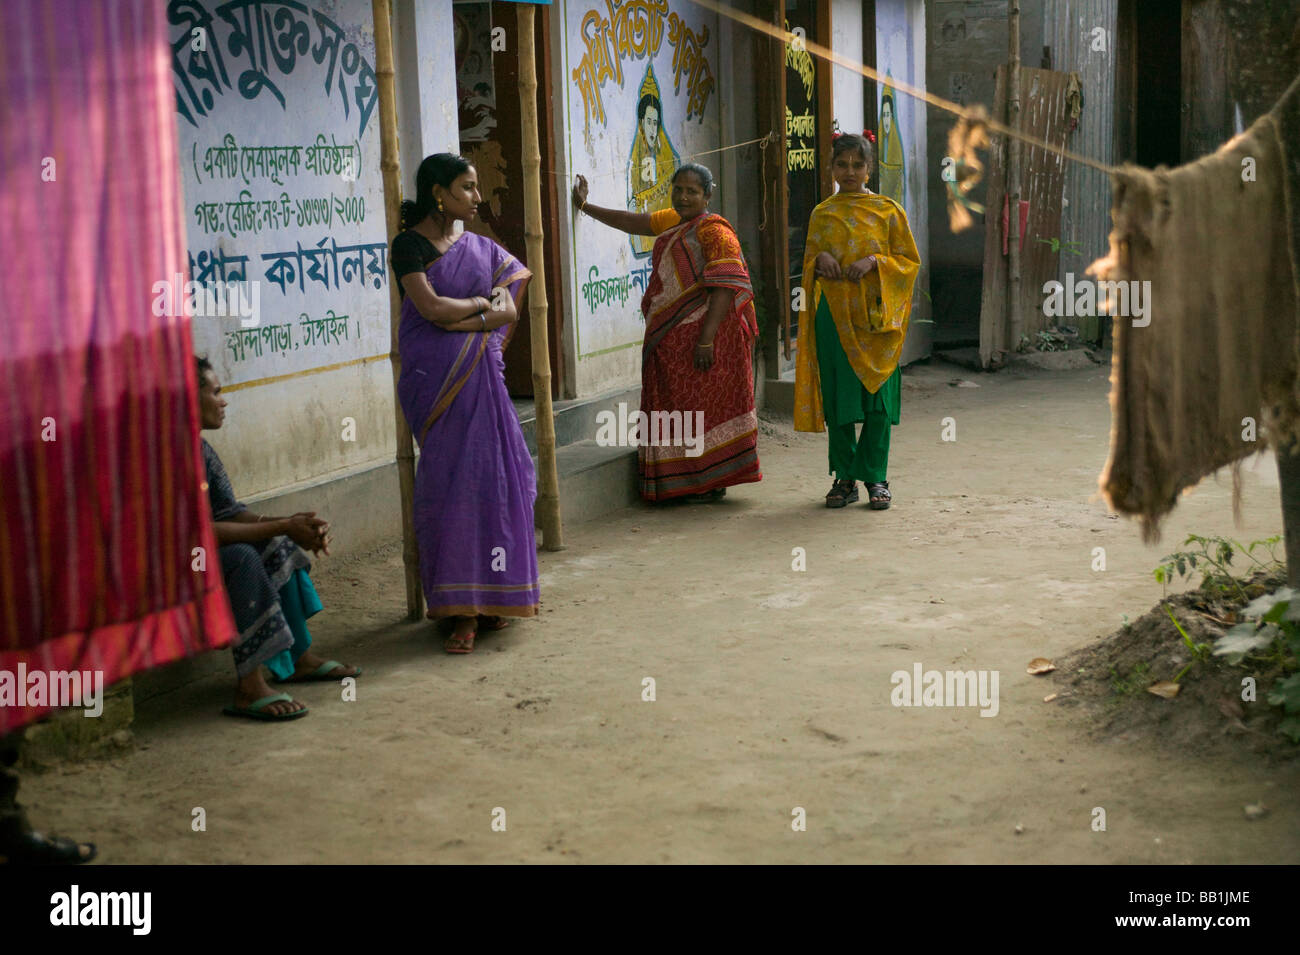 Women in brothel, Tangail, Bangladesh. - Stock Image